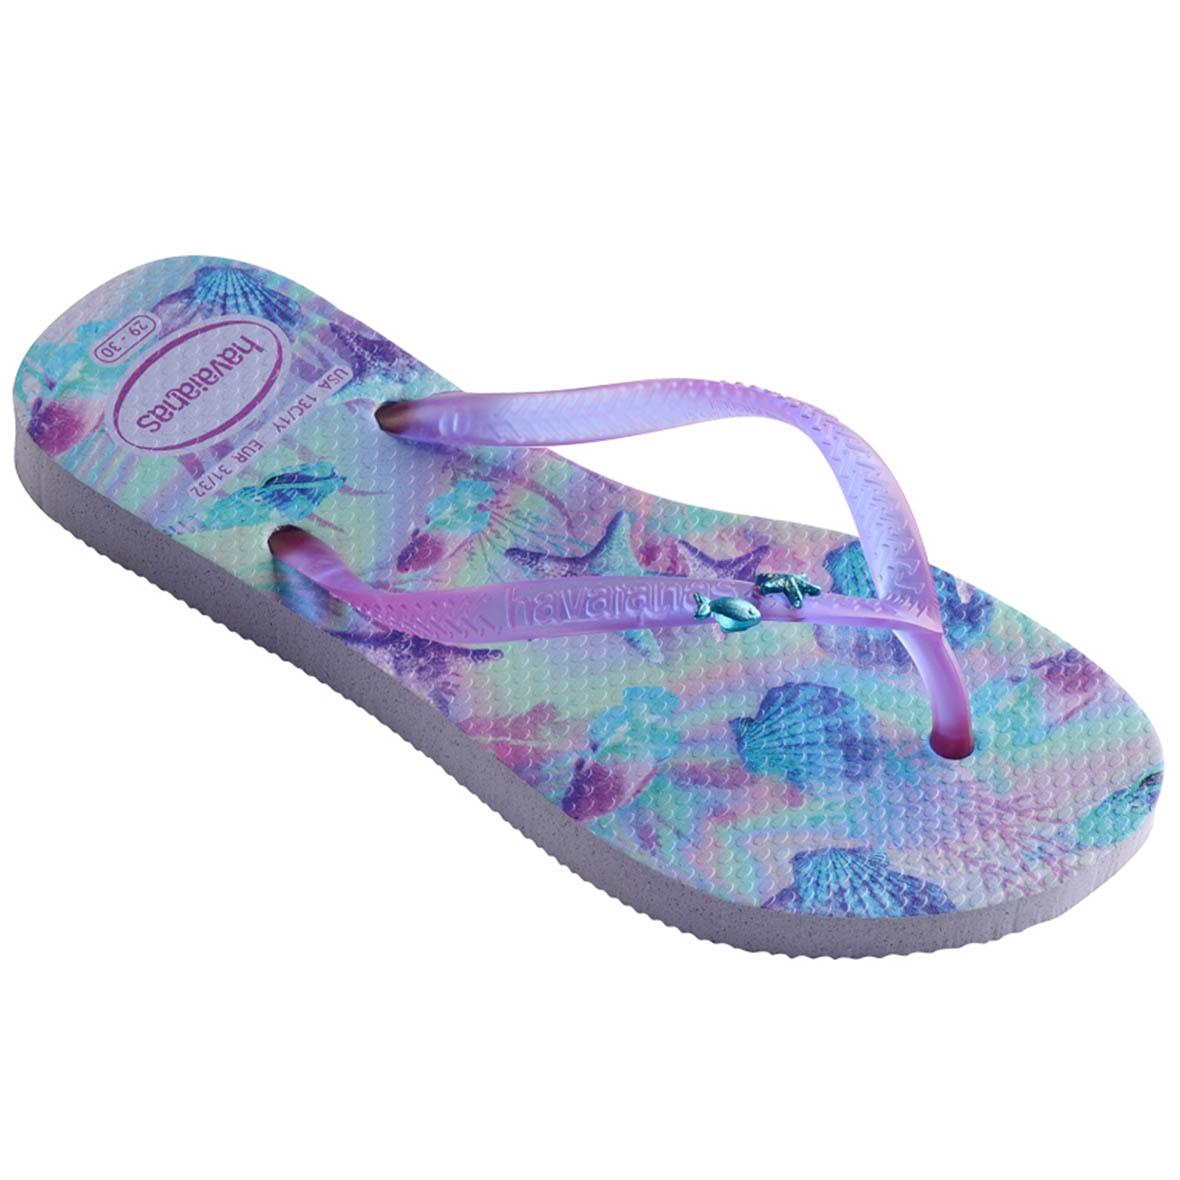 4e996d6bc34b Havaianas Juniors   11-4  Slim Summer Flip Flop Sandal